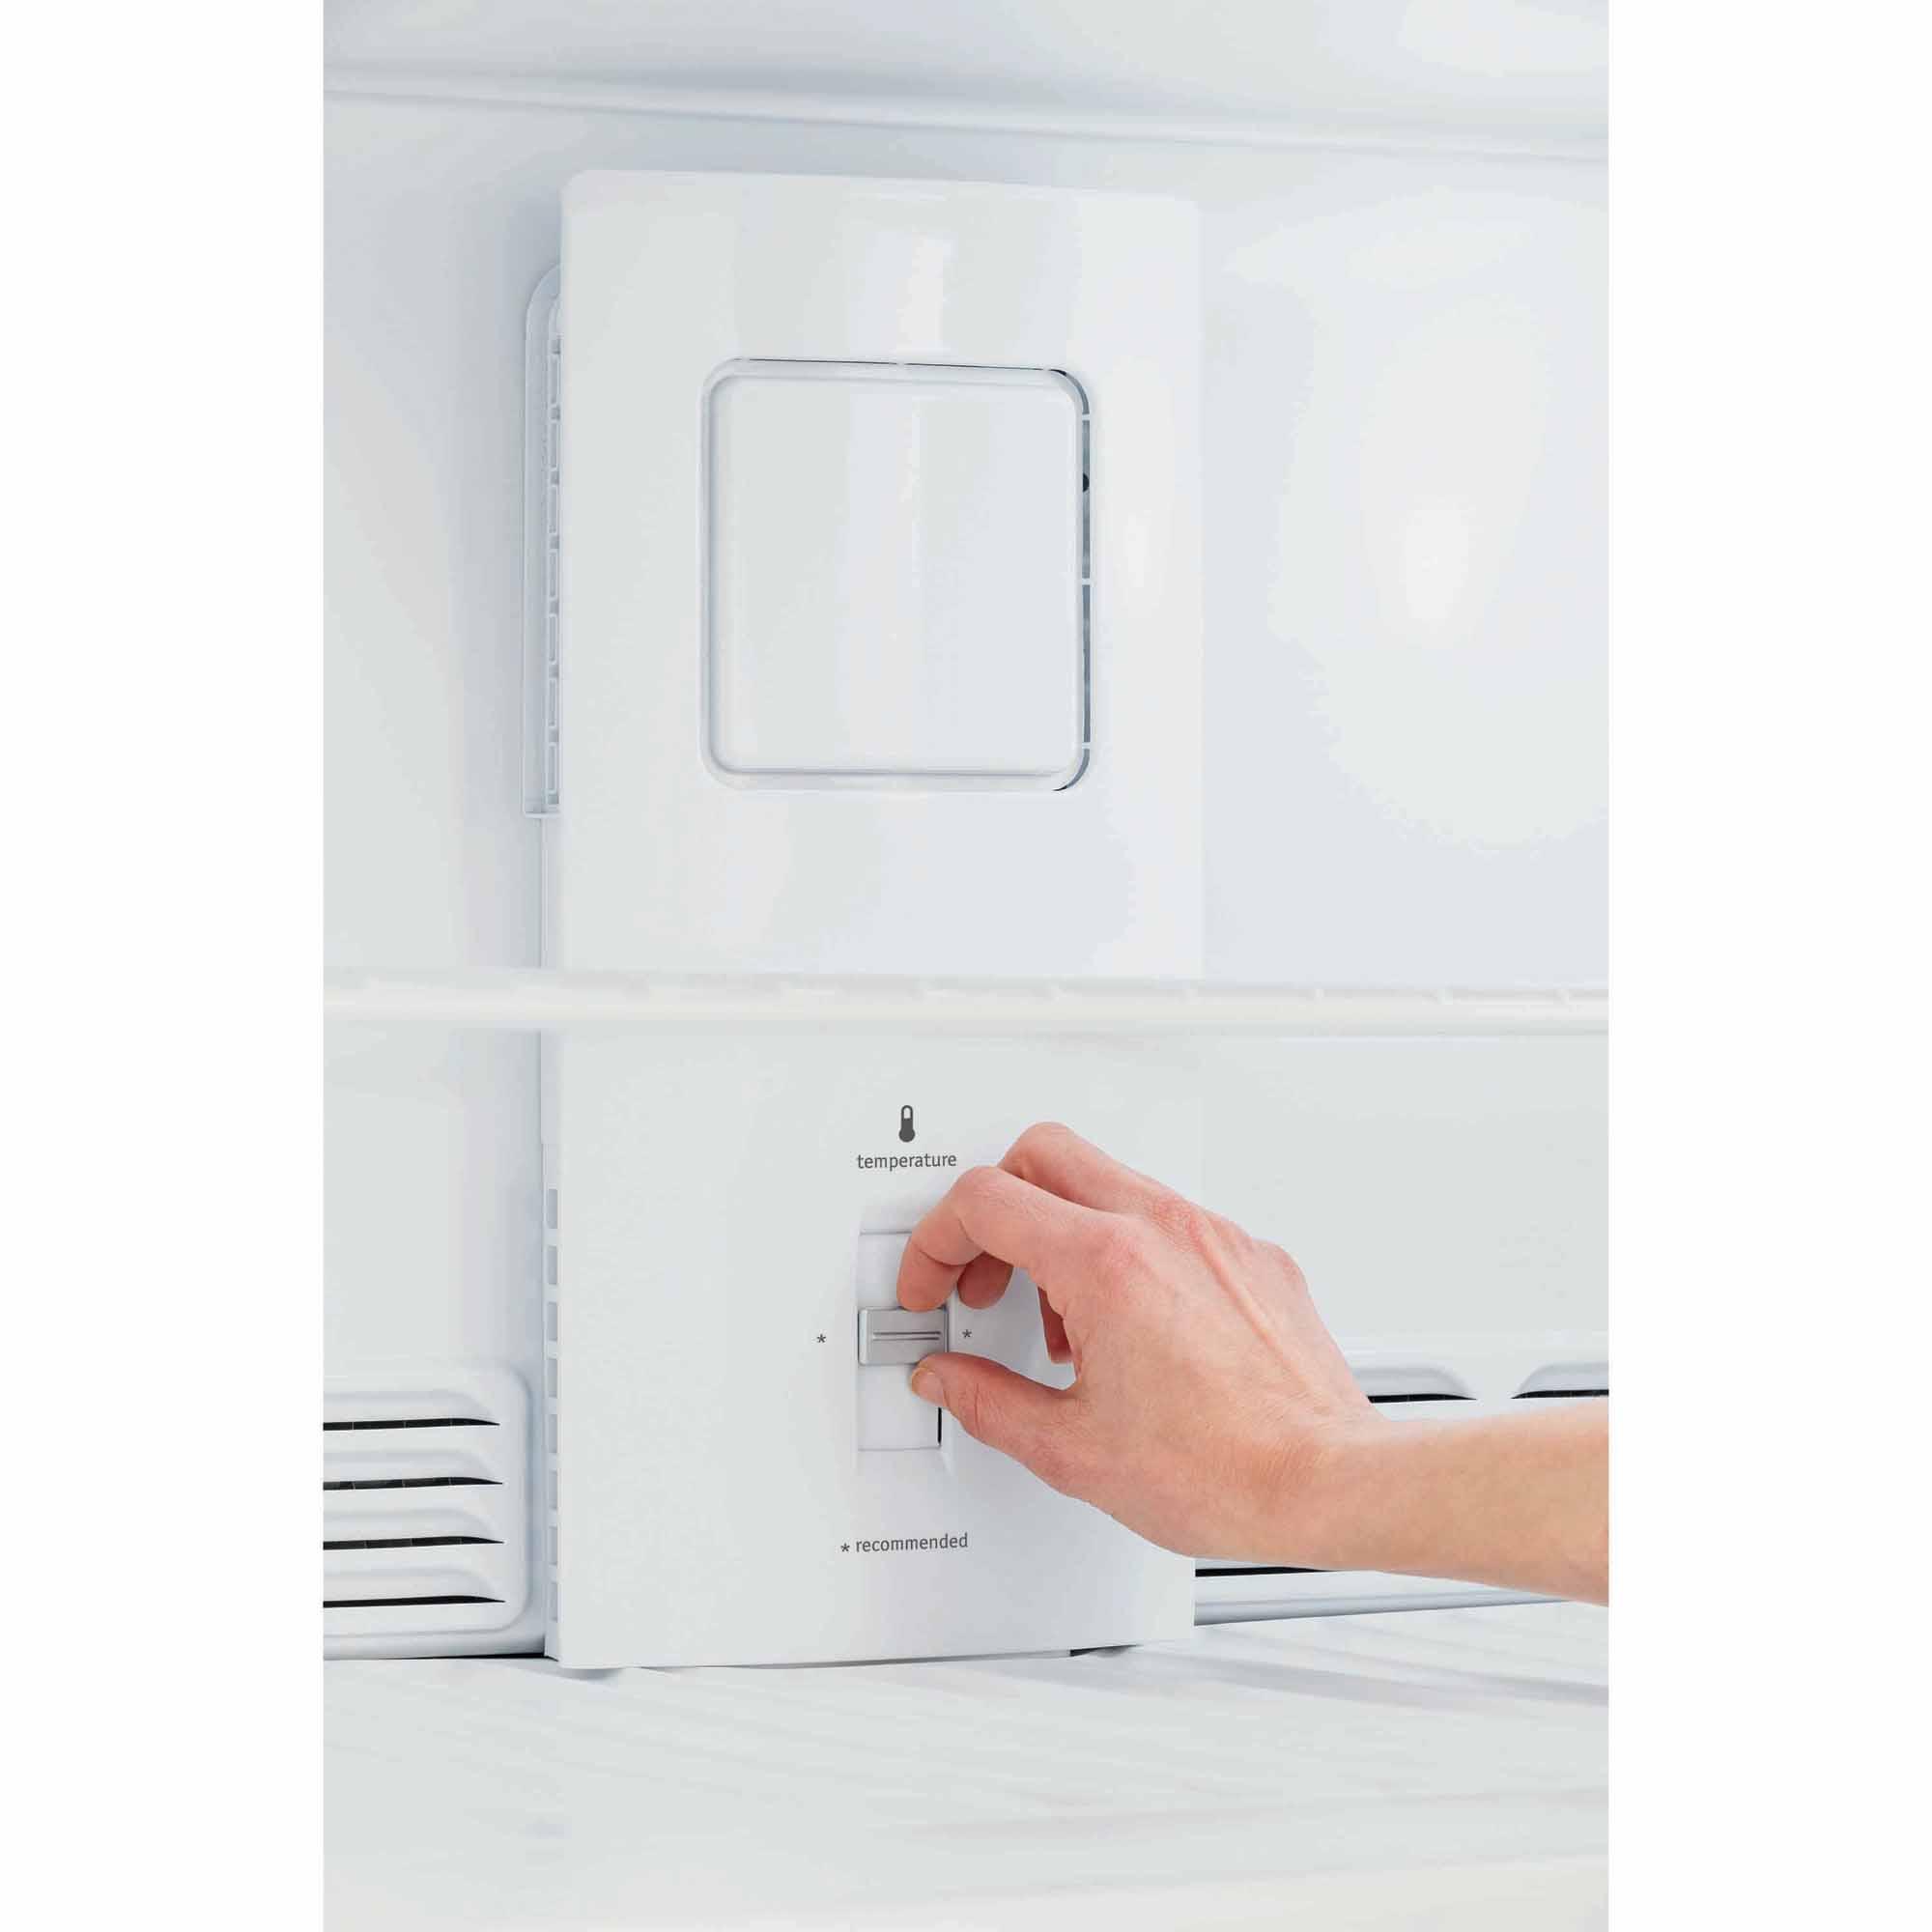 Frigidaire FFHT2021QB 20.4 cu. ft. Top Freezer Refrigerator - Black